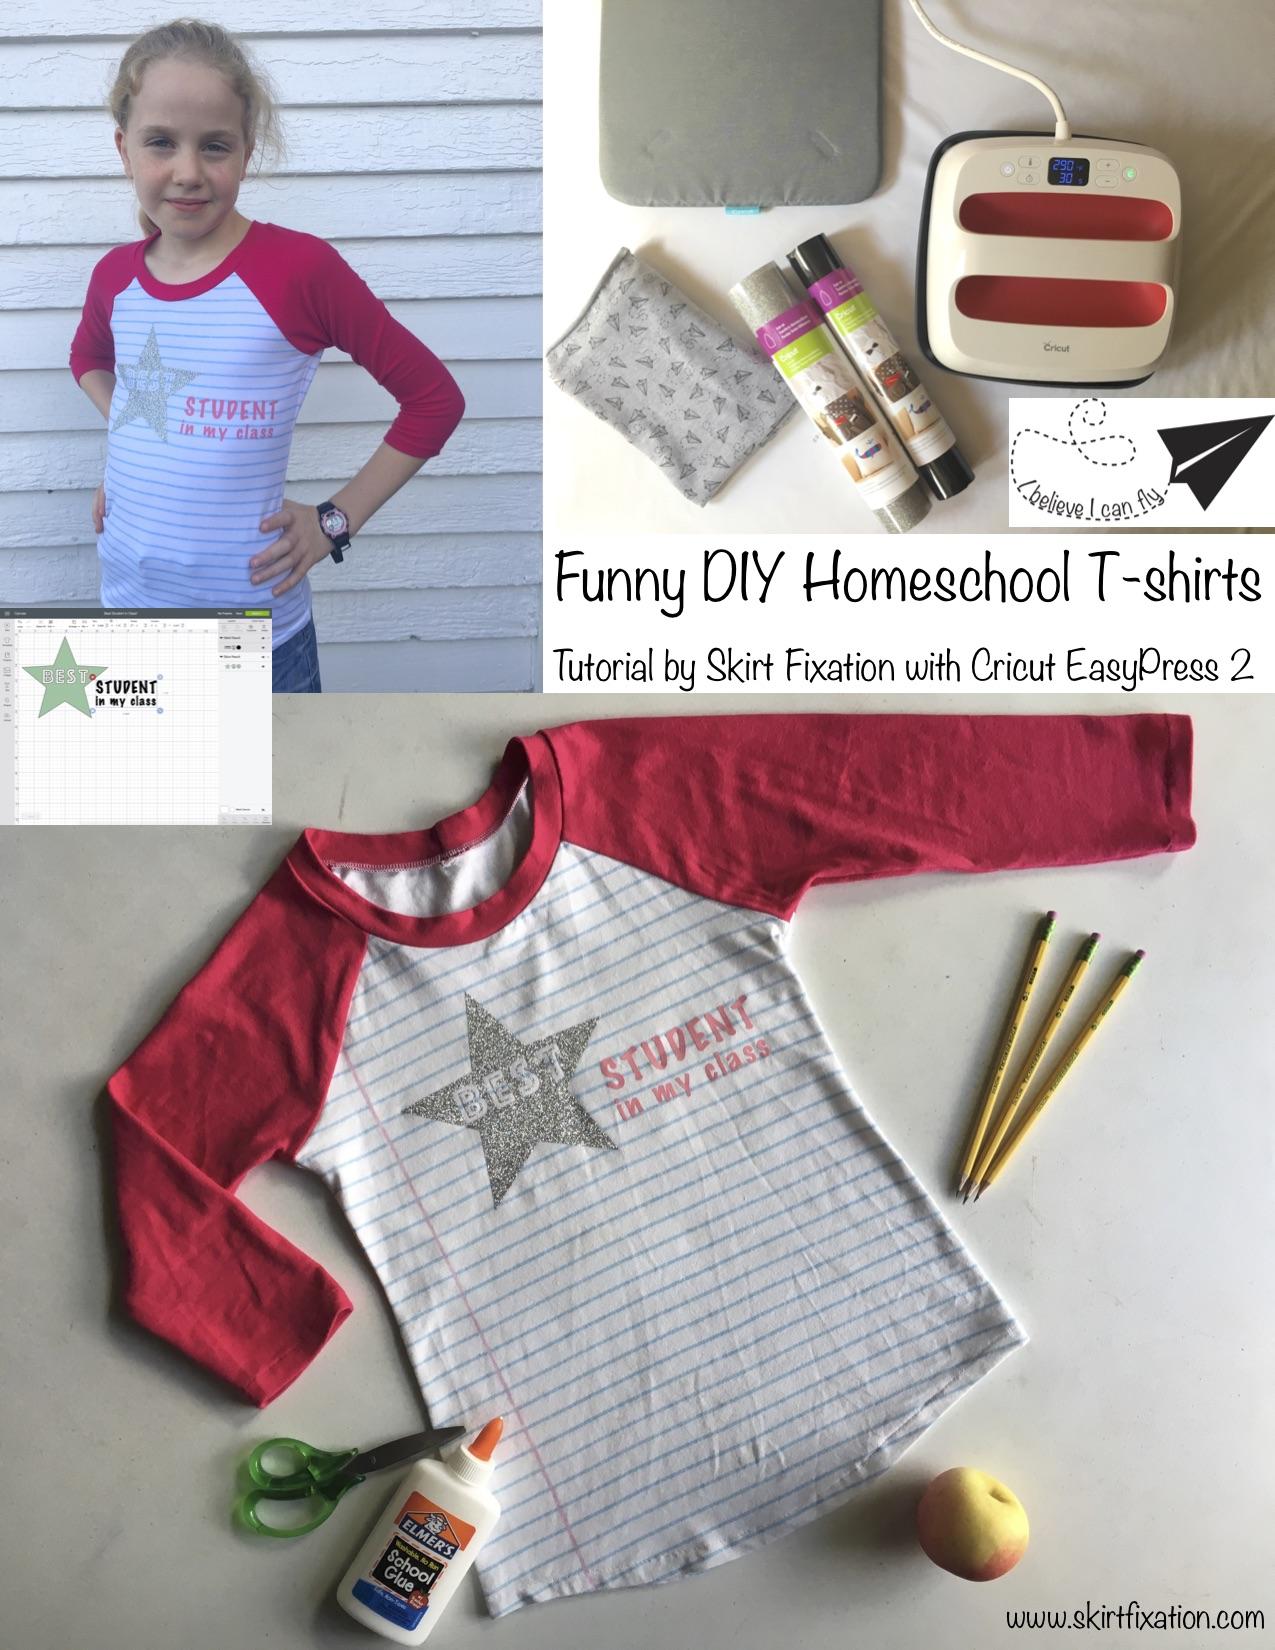 Funny DIY Homeschool t-shirt tutorial by Skirt Fixation